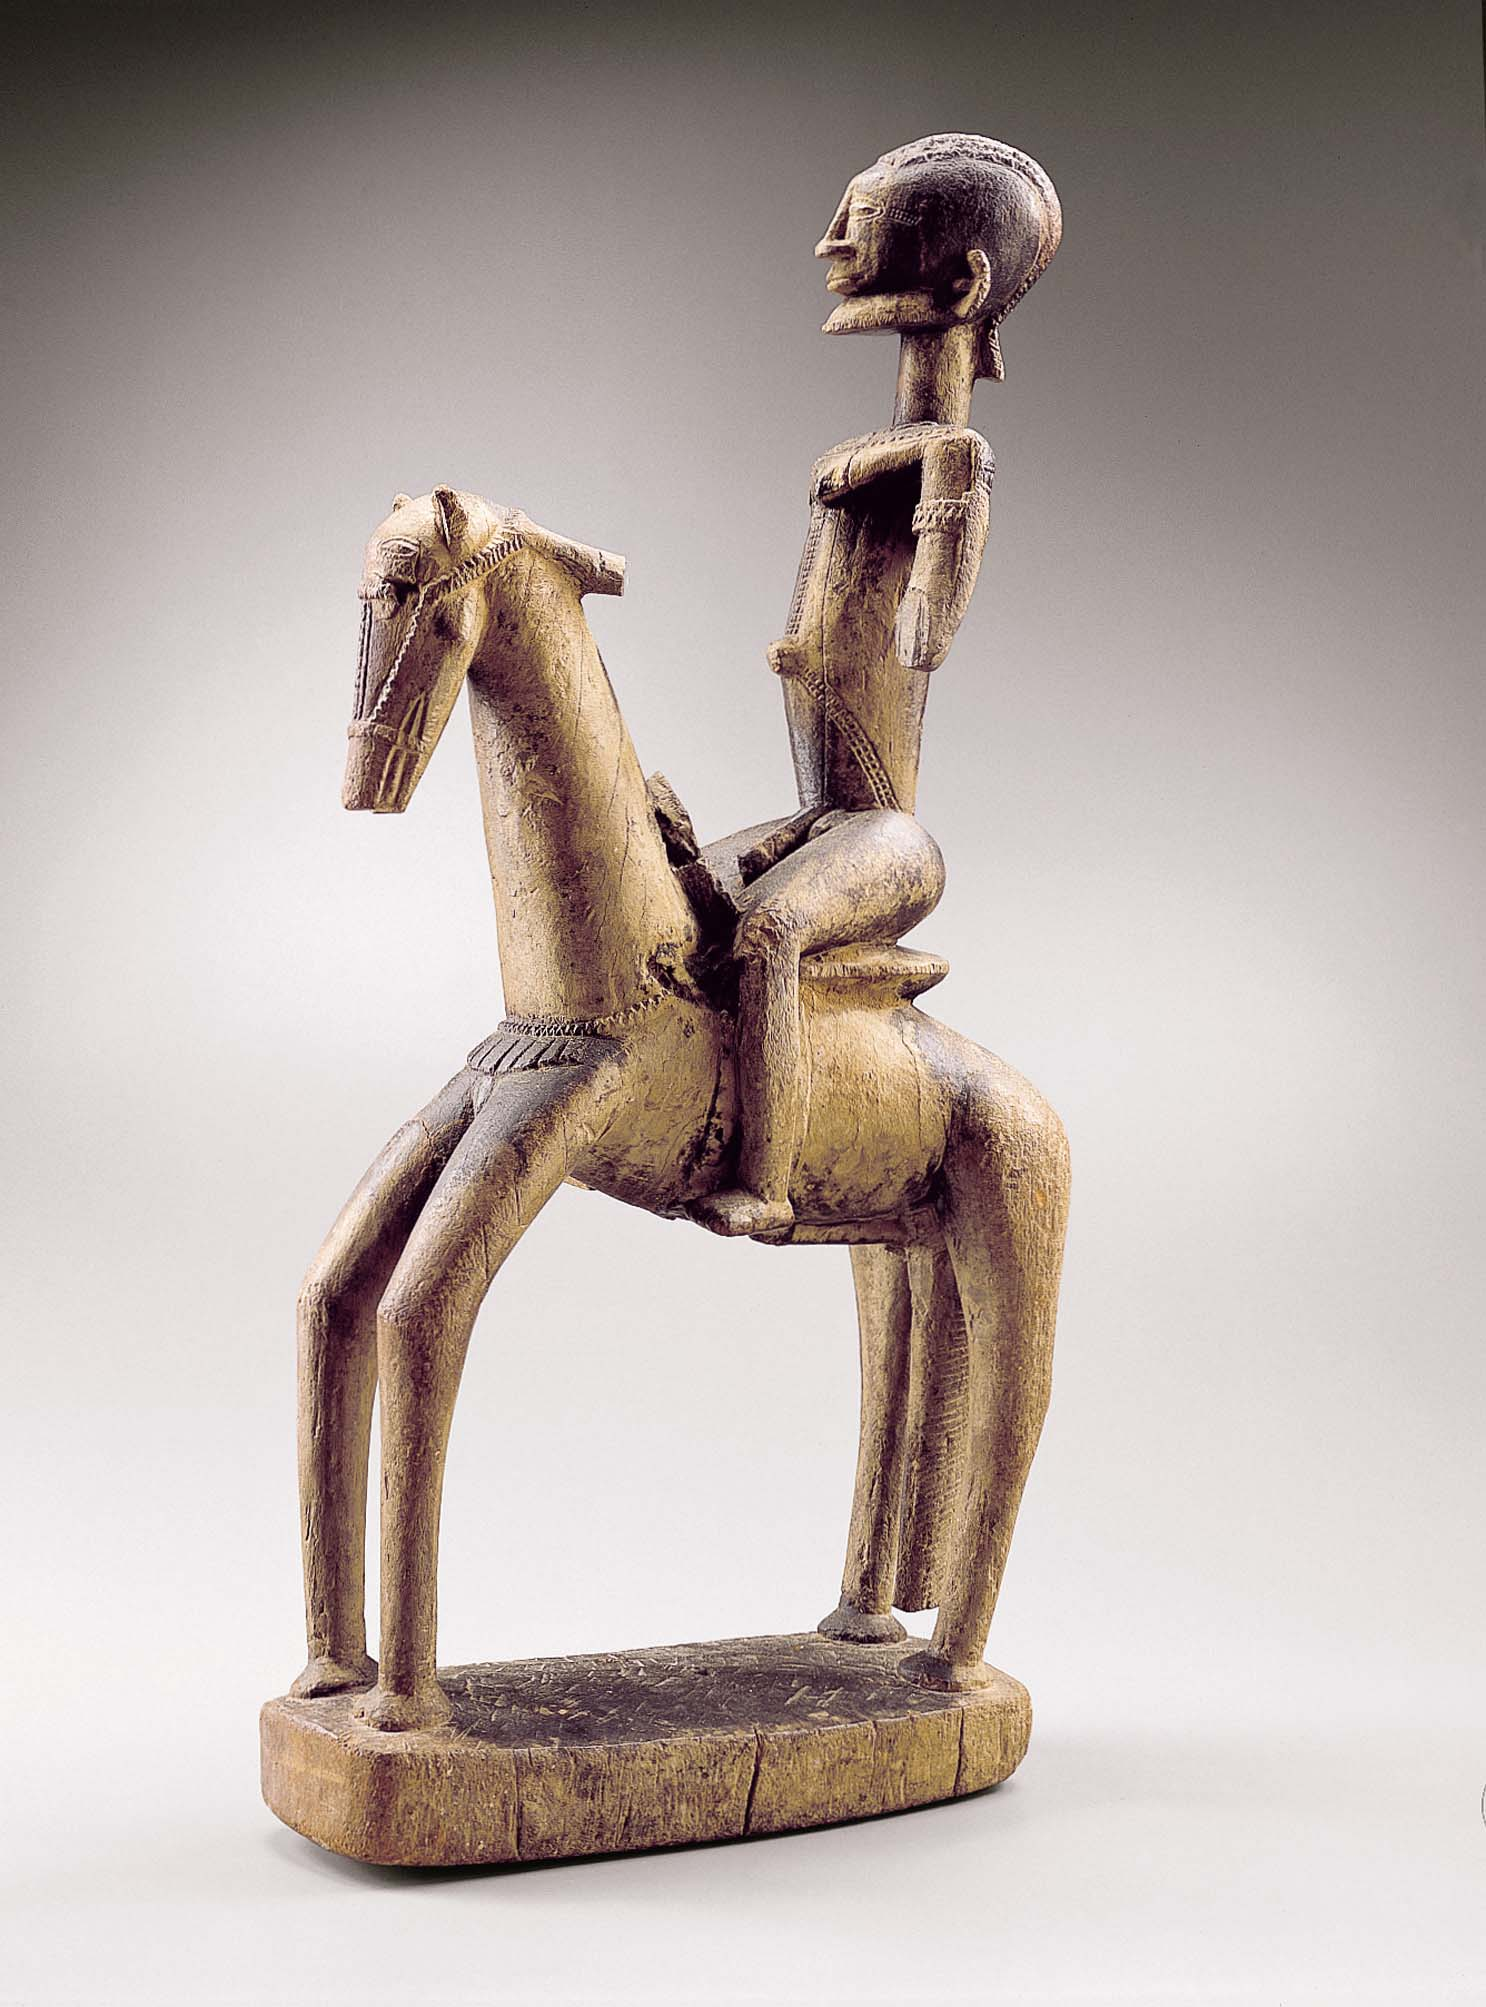 Equestrian, Dogon peoples, Mali 16th–18th century, Photo credit: © Archives Fondation Dapper—Photo Hughes Dubois